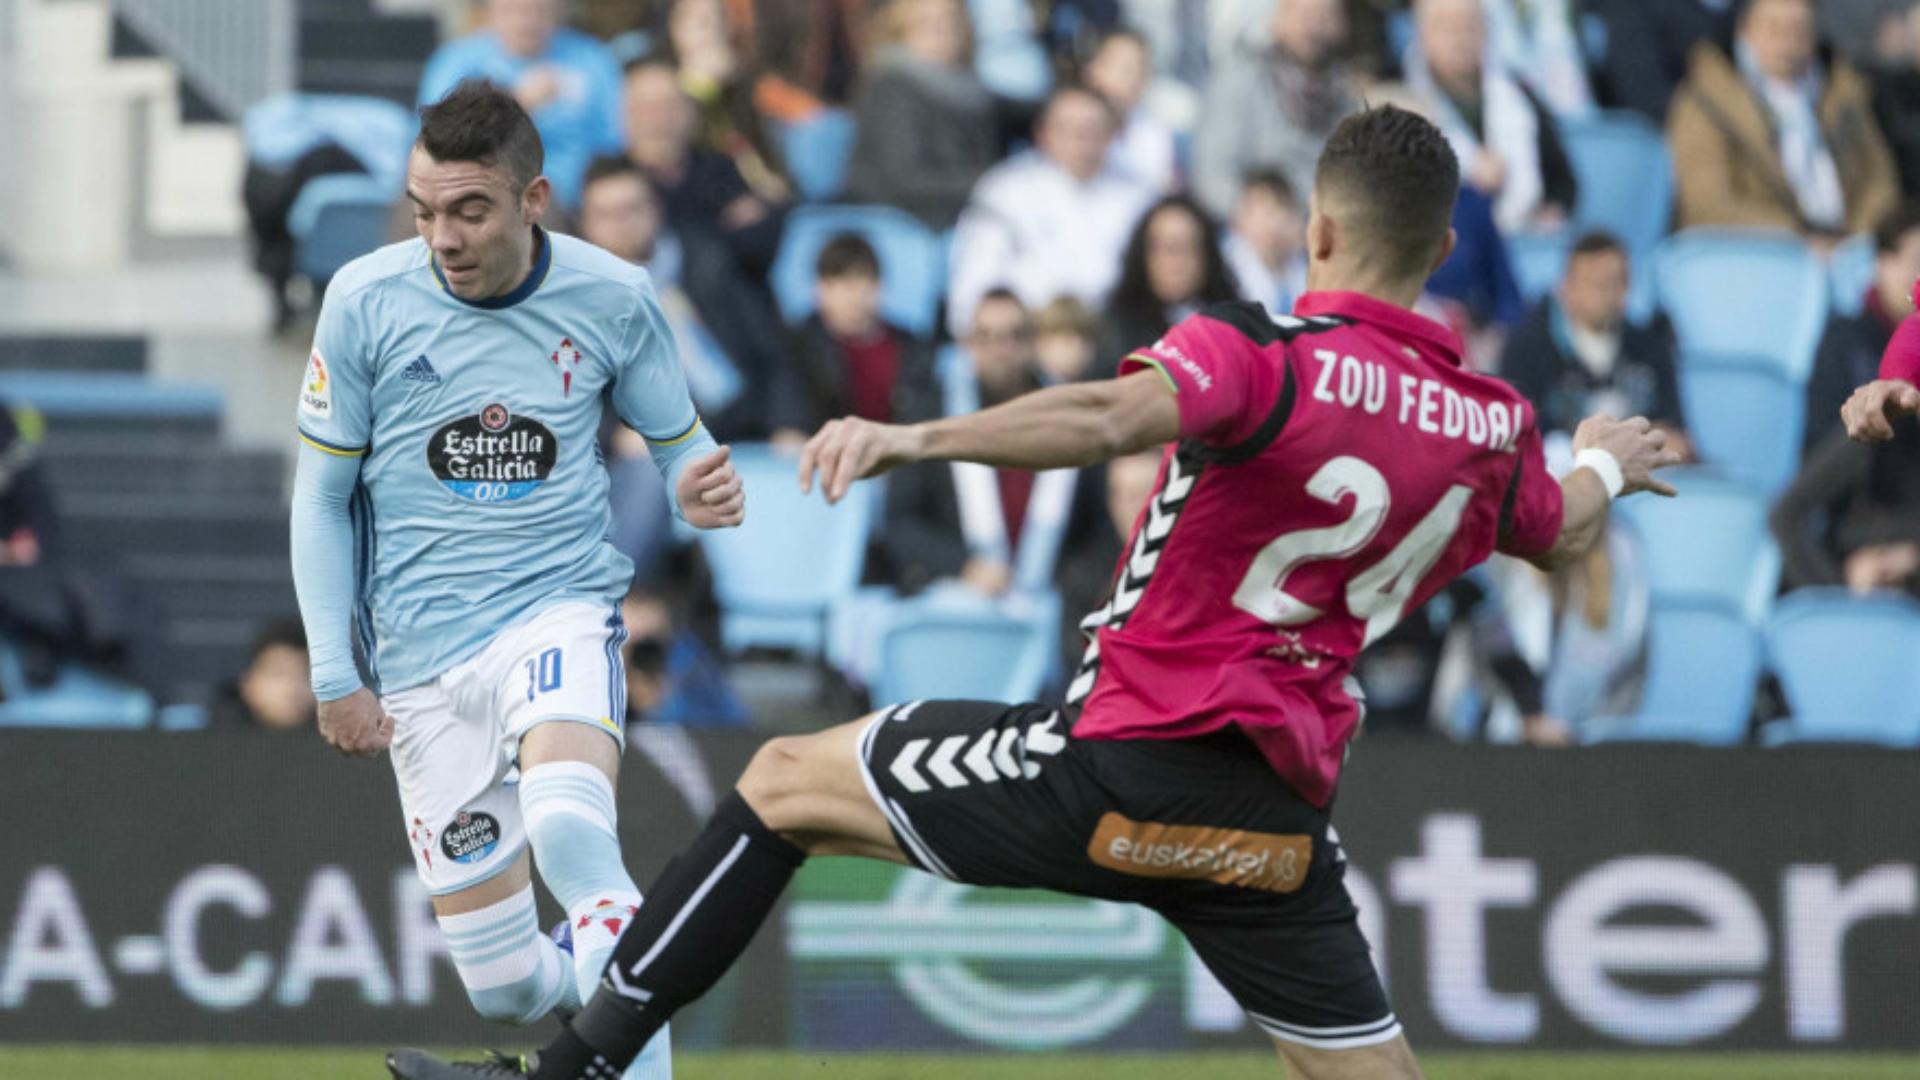 Iago Aspas Feddal Celta Alaves La Liga